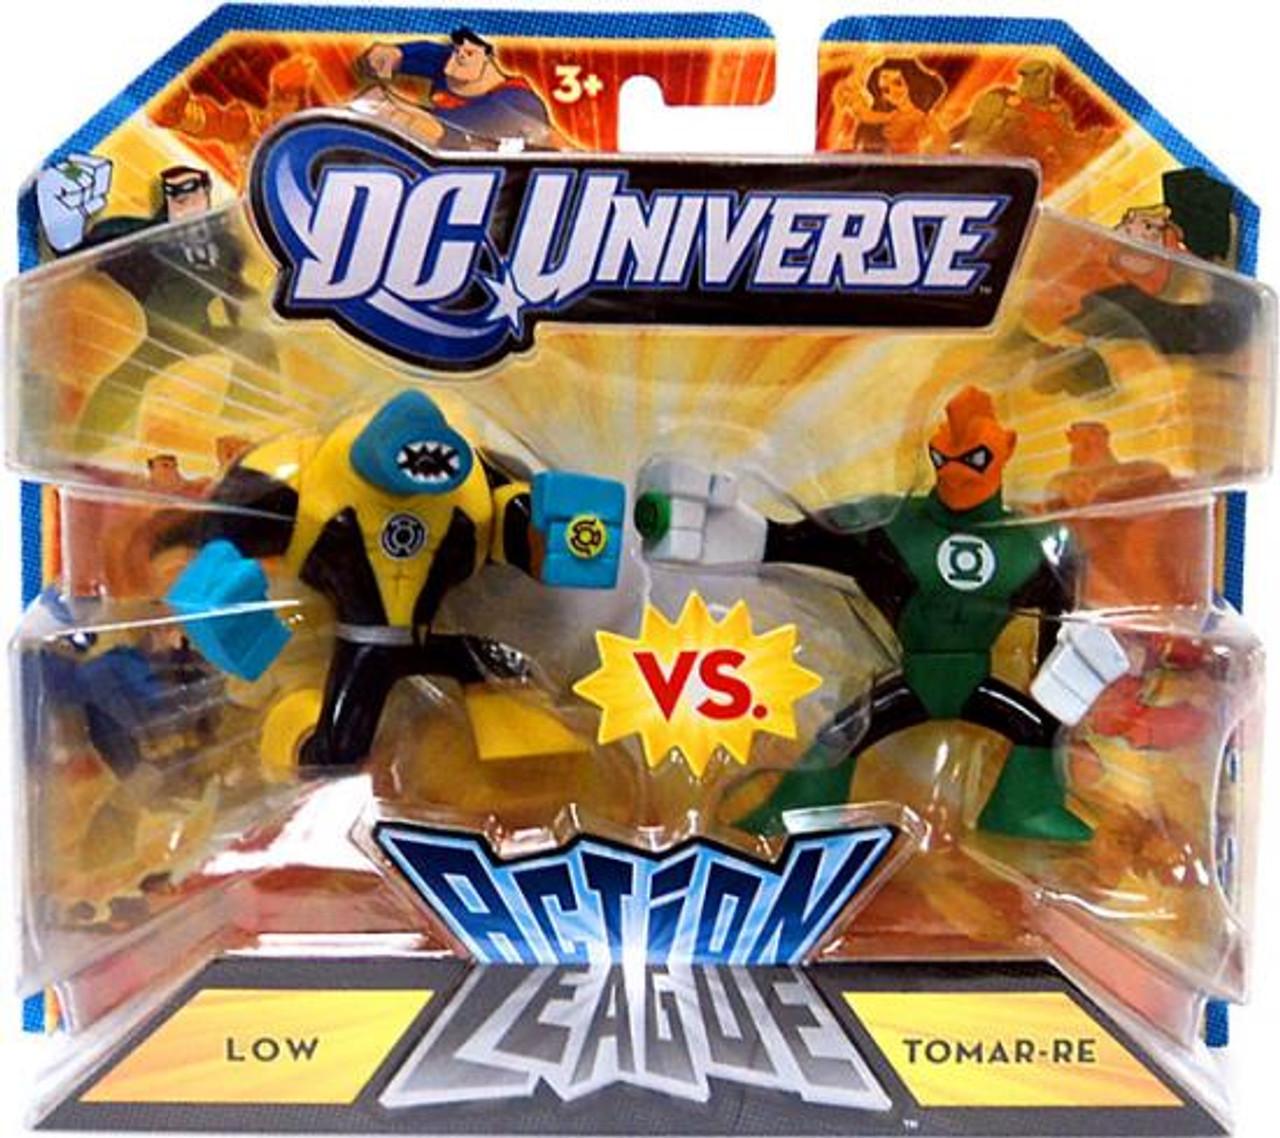 DC Universe Green Lantern Action League Low vs. Tomar-Re 3-Inch mini Figures